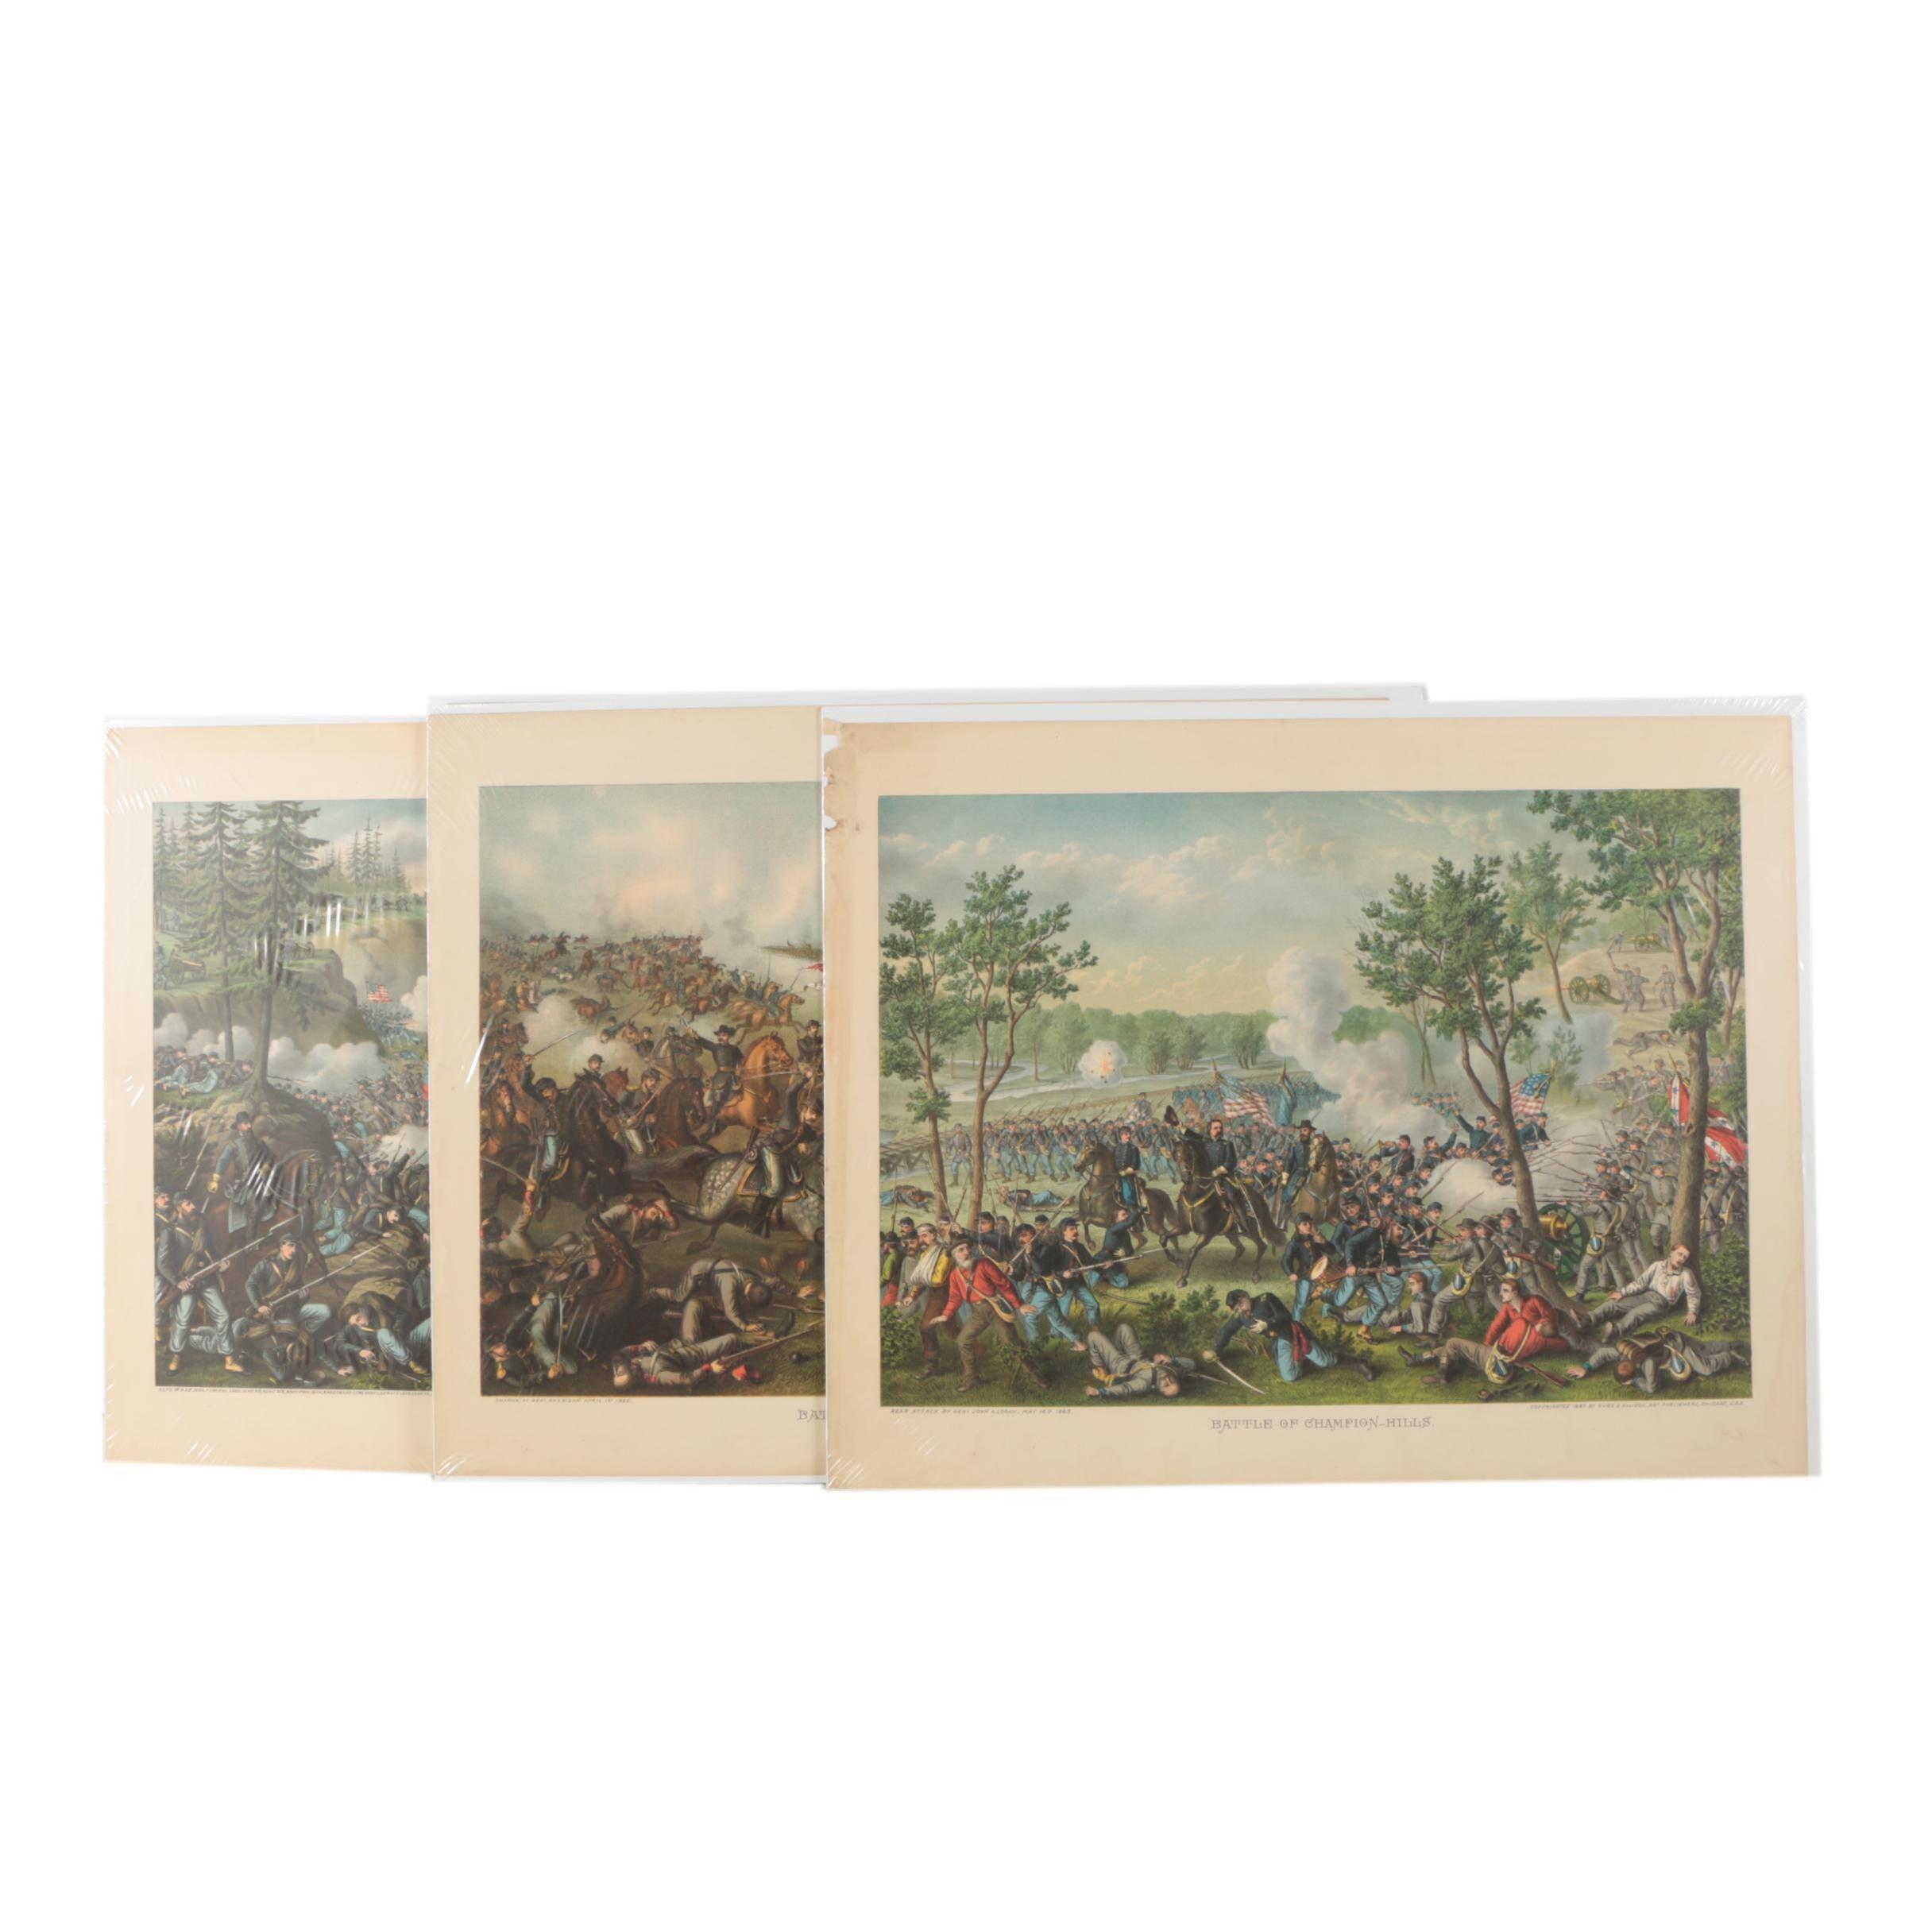 Antique Kurz and Allison Civil War Chromolithgraphs